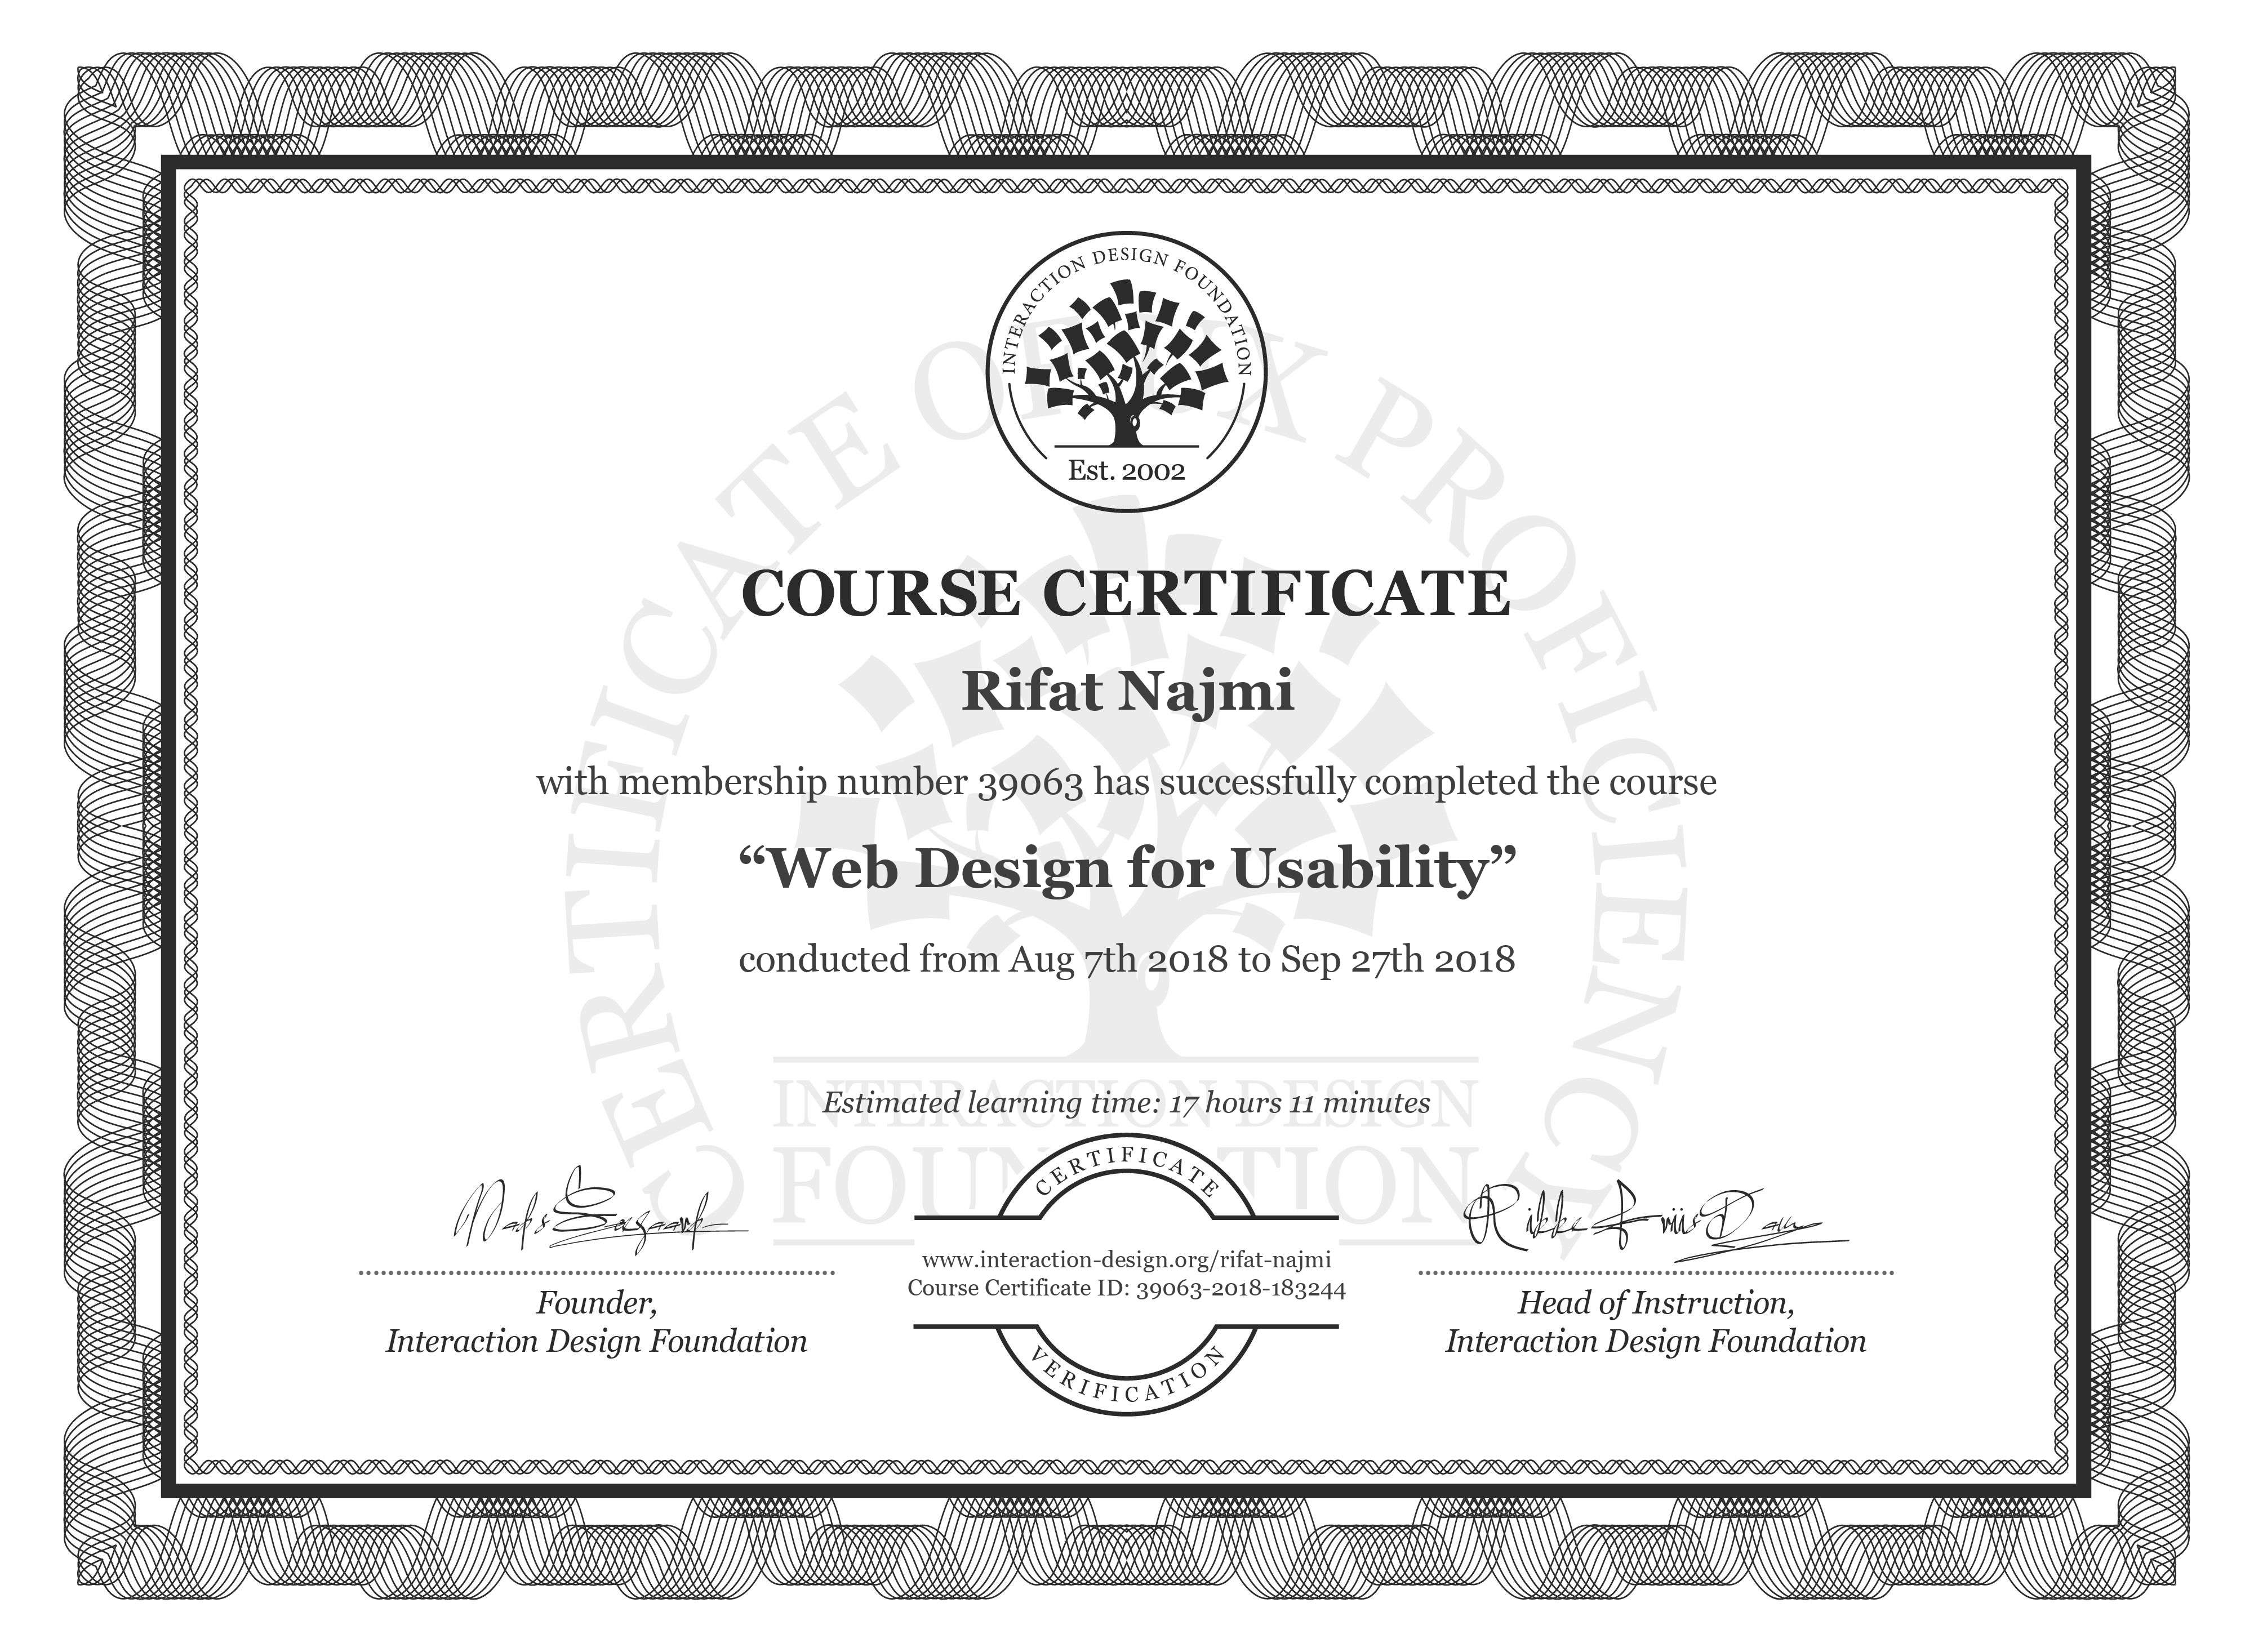 Rifat Najmi's Course Certificate: Web Design for Usability